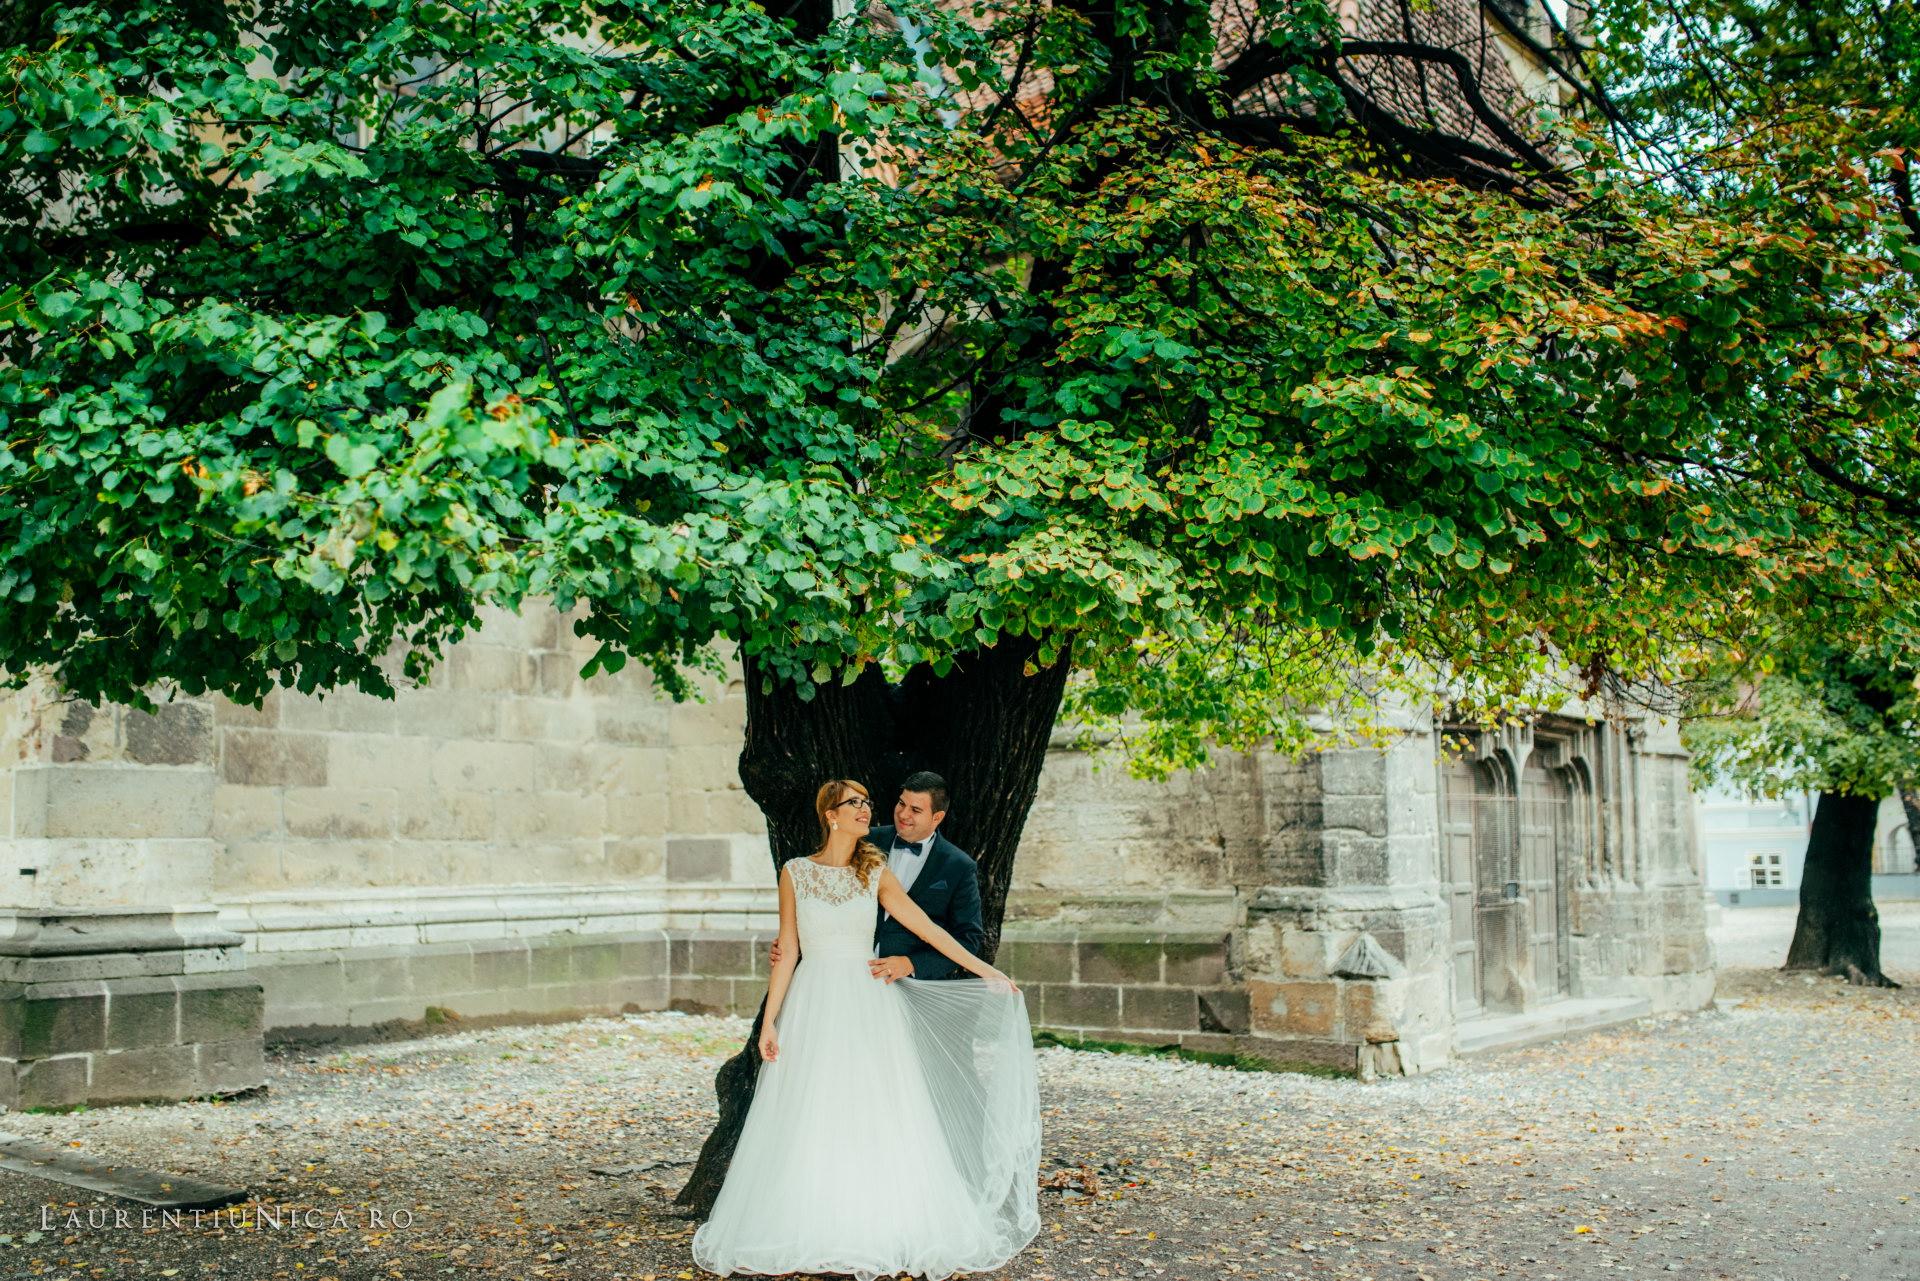 iulia-si-cosmin-fotografii-after-wedding-brasov-laurentiu-nica11